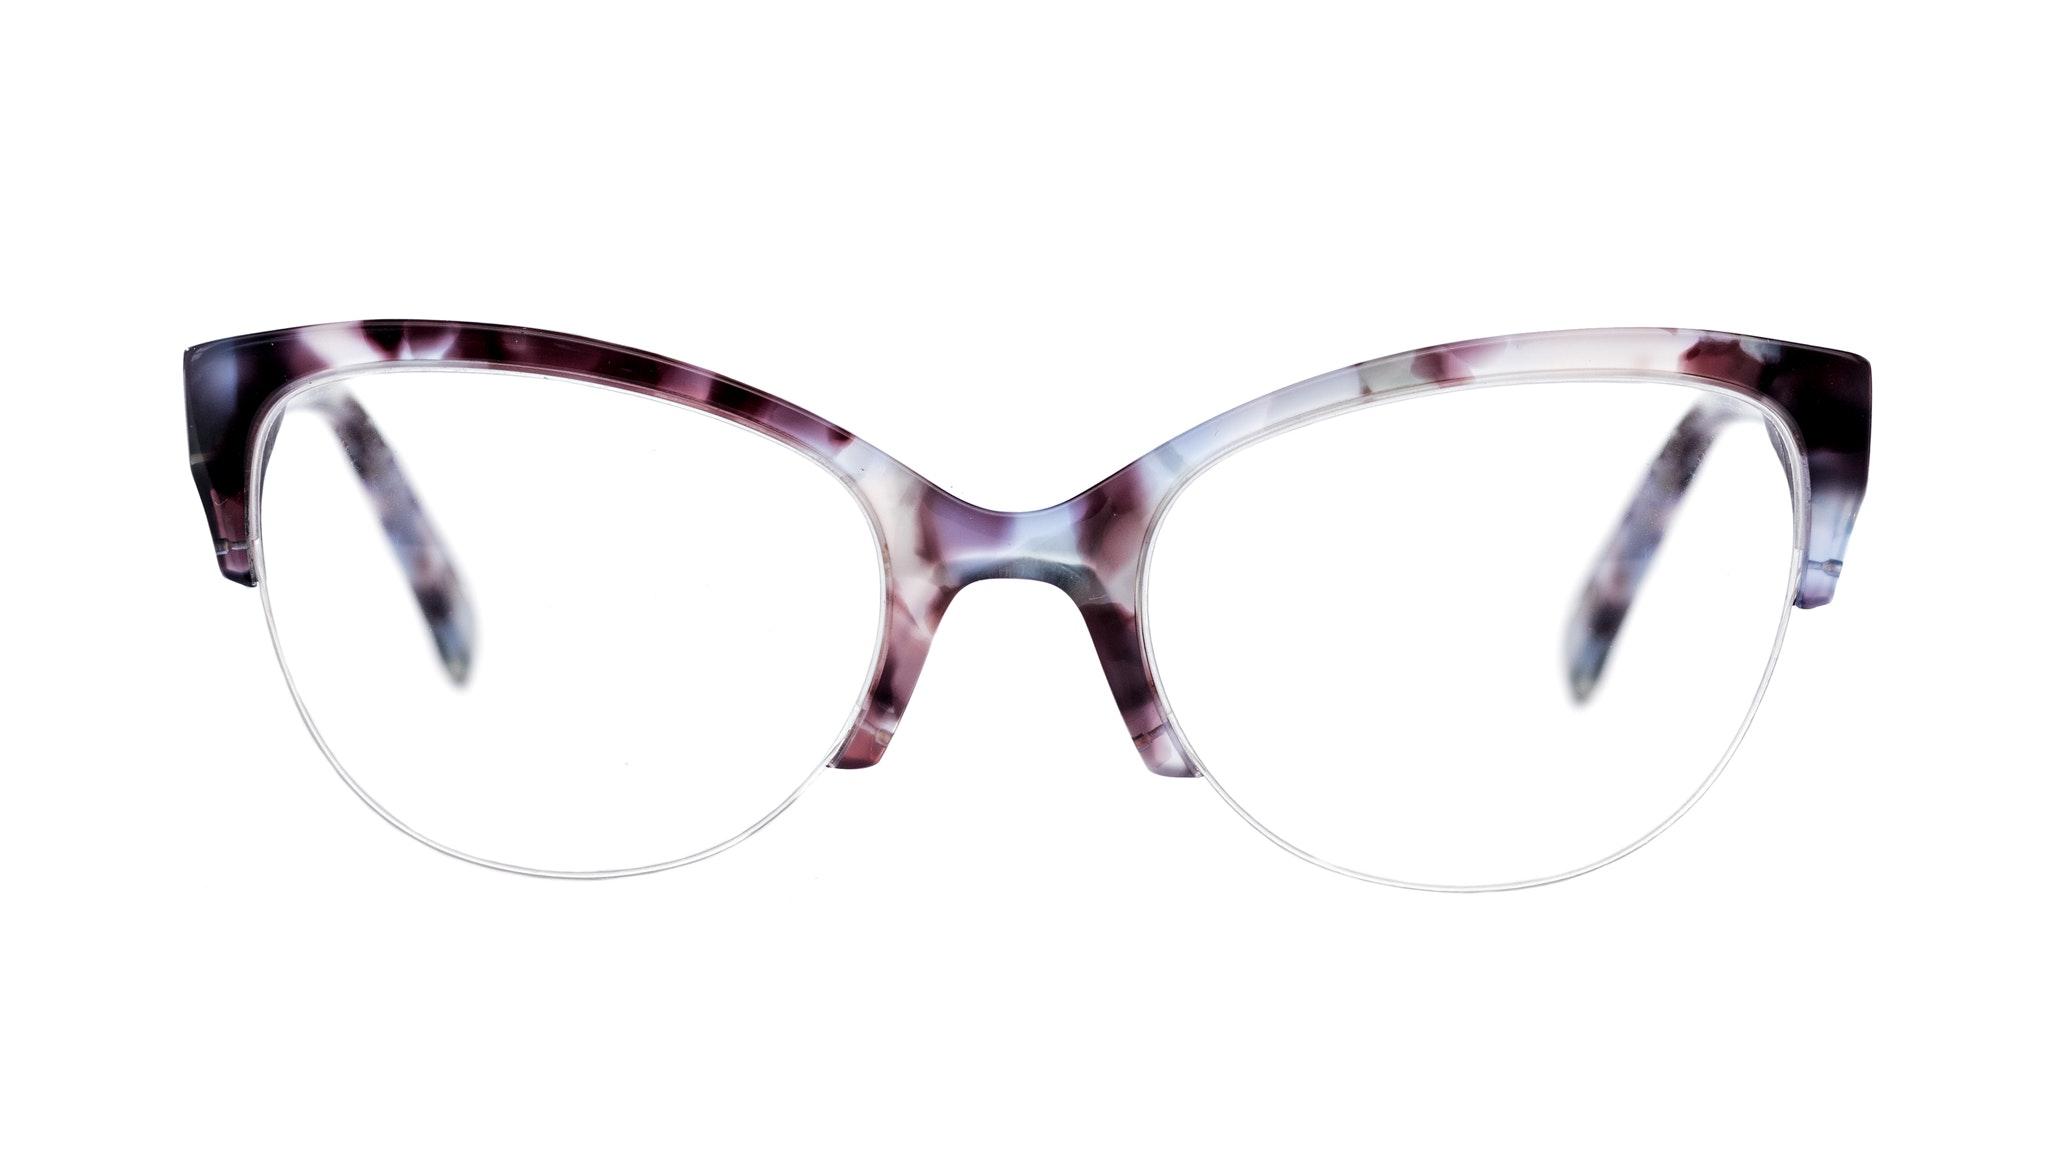 Affordable Fashion Glasses Cat Eye Eyeglasses Women Lovely Lilac Tort